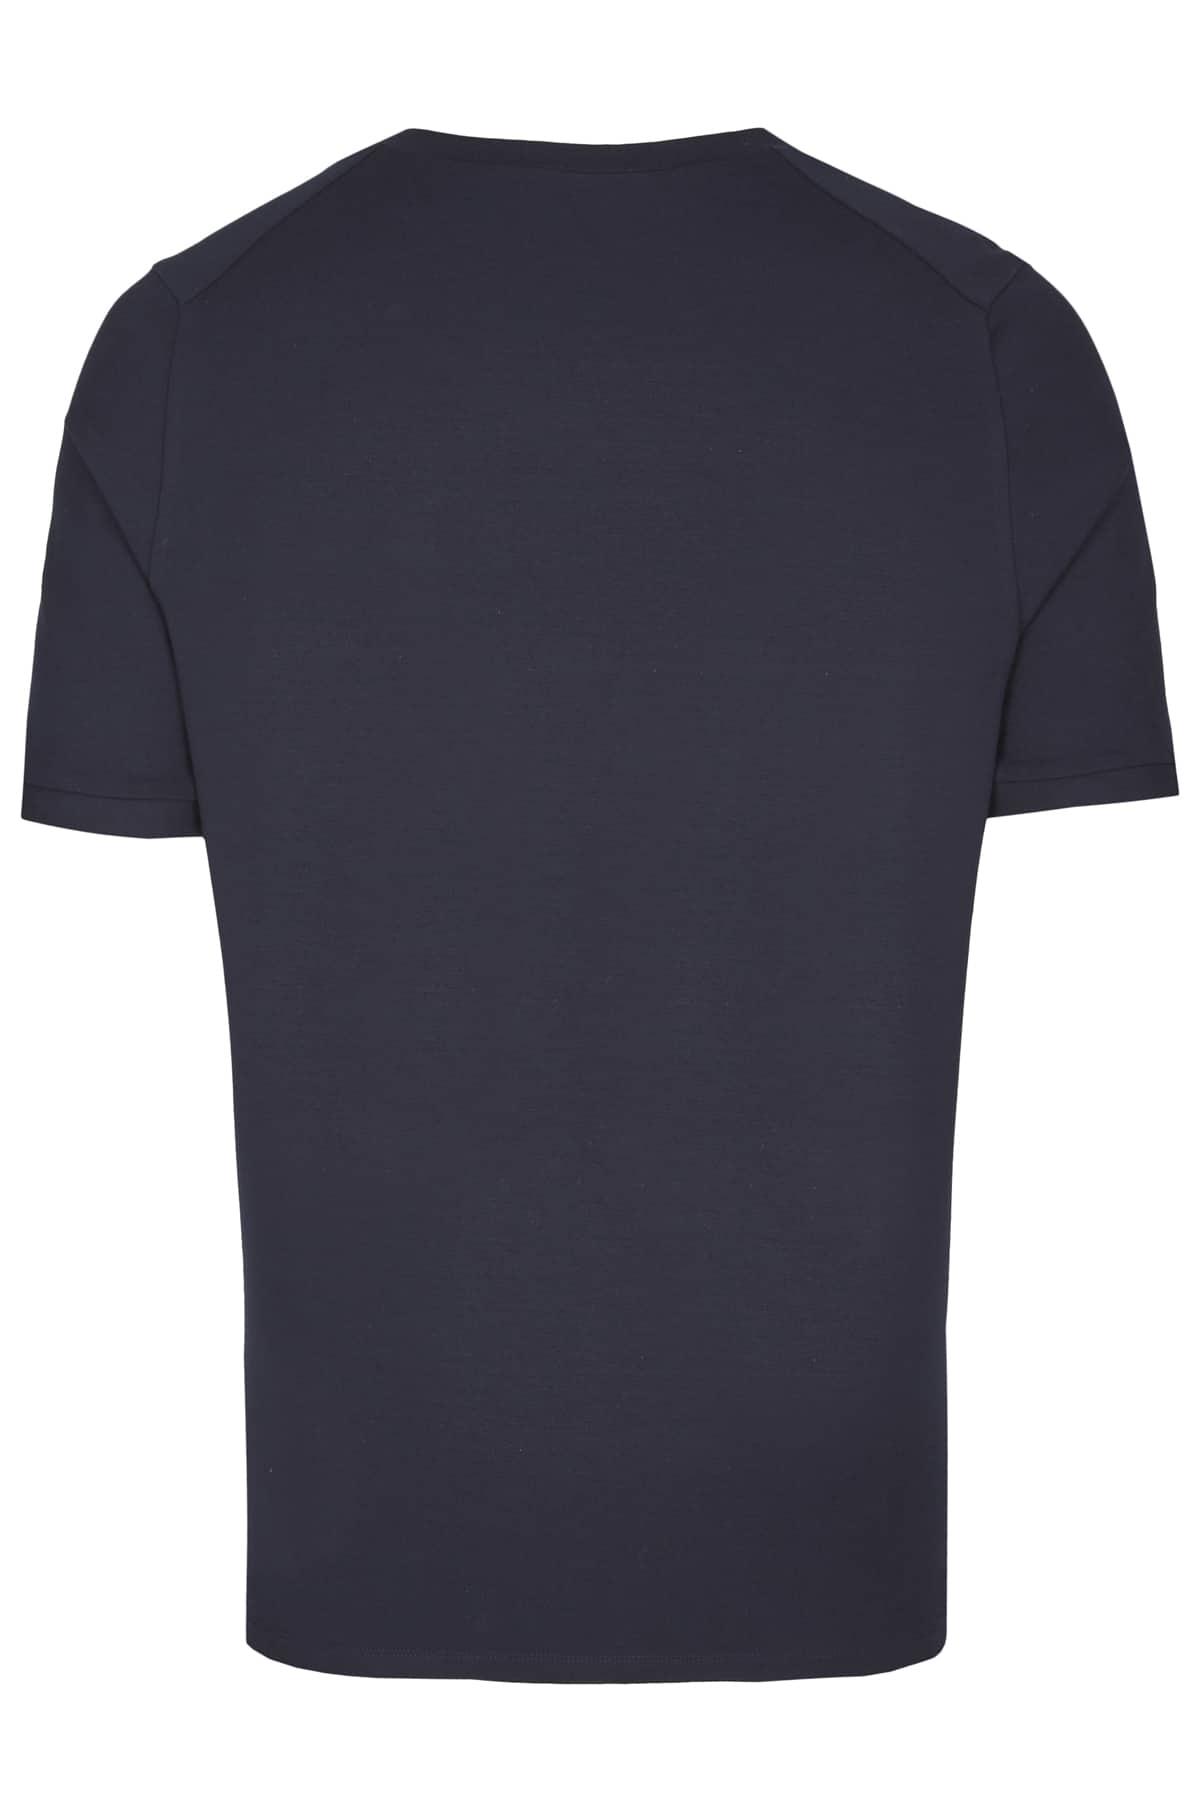 T-shirt_dunkelblau_2